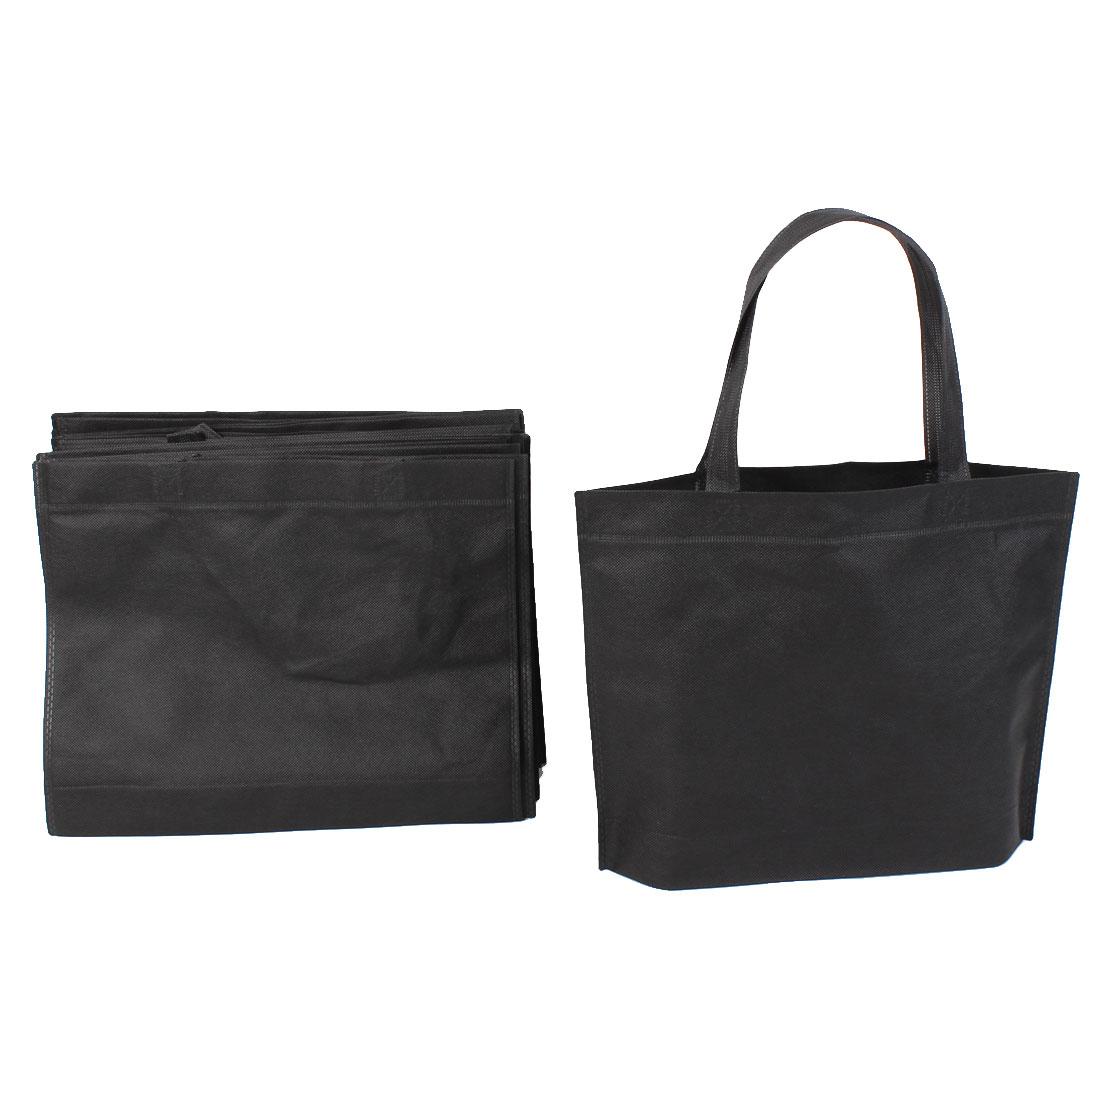 Home Non Woven Folding Storage Shopping Bag 35cm x 28cm Black 20 Pcs